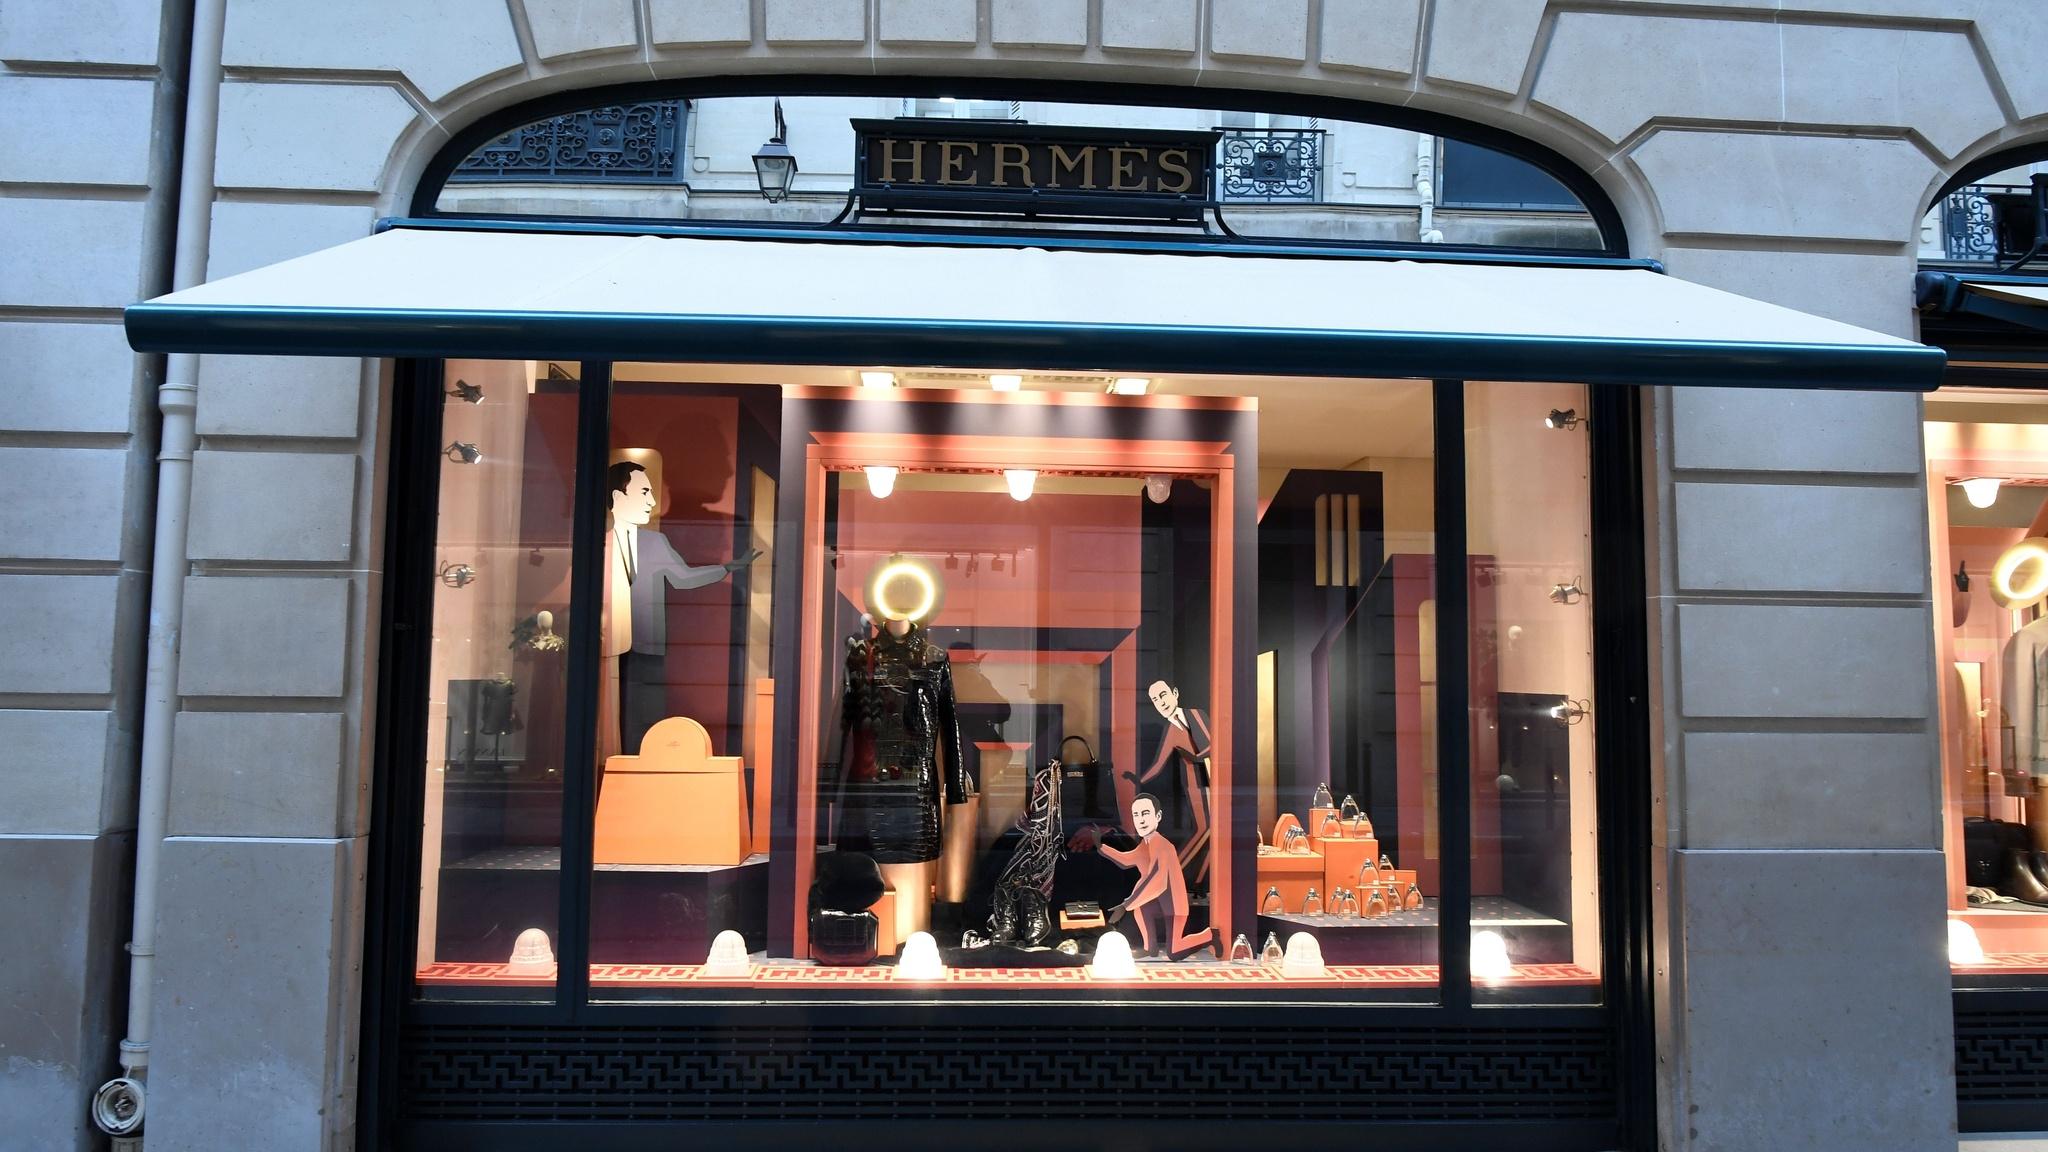 A Beautiful Year Hermès Lifts Revenues 9 Despite Fourth